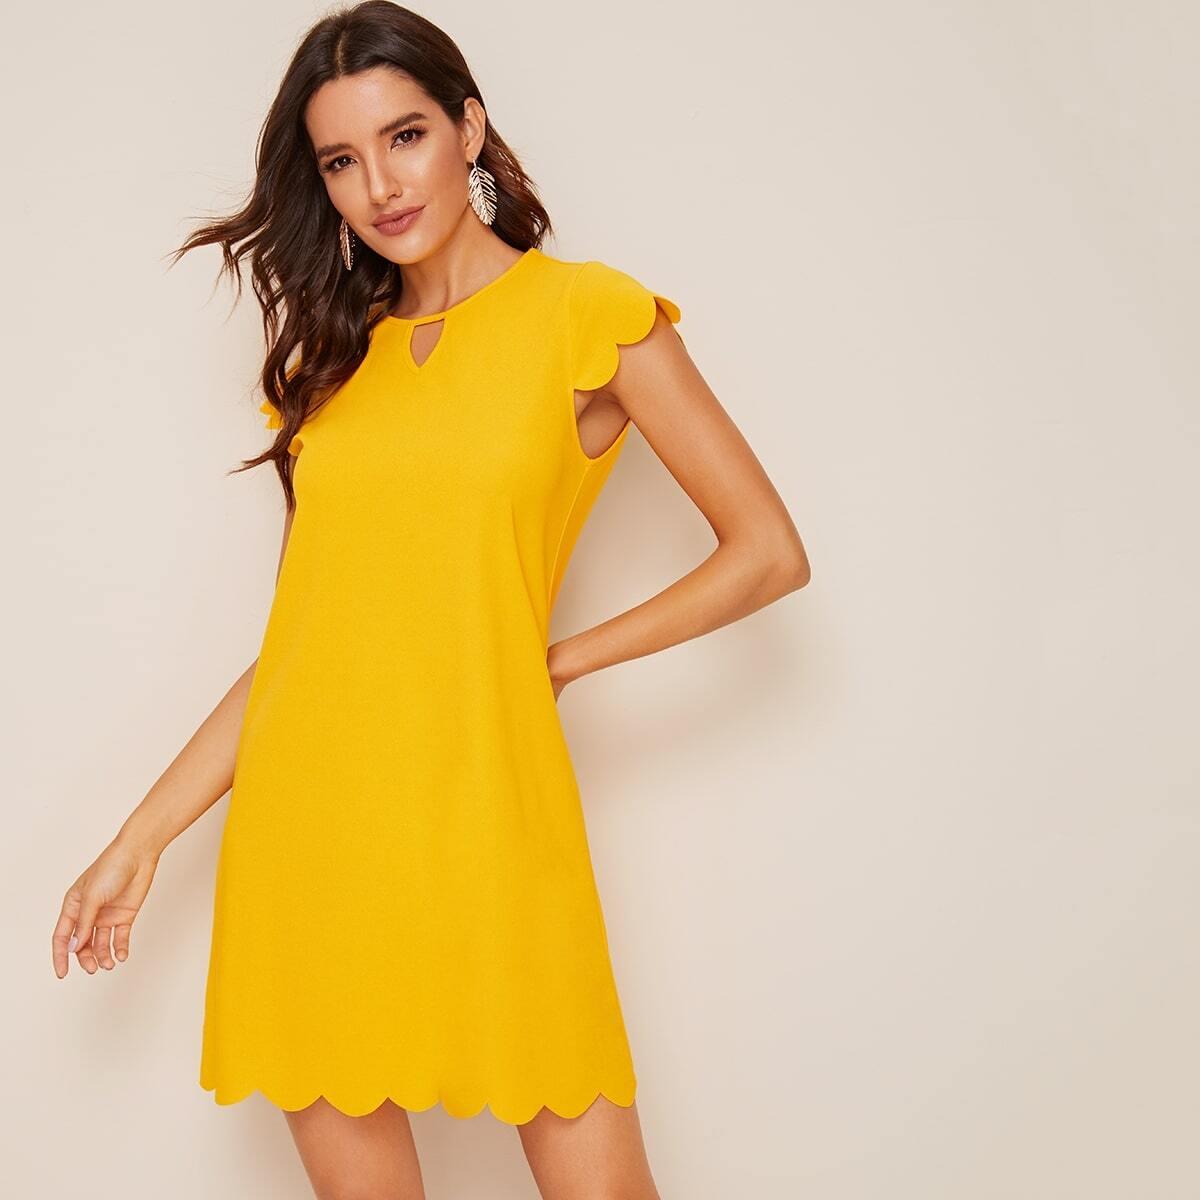 SHEIN coupon: Keyhole Neck Scallop Edge Tunic Dress